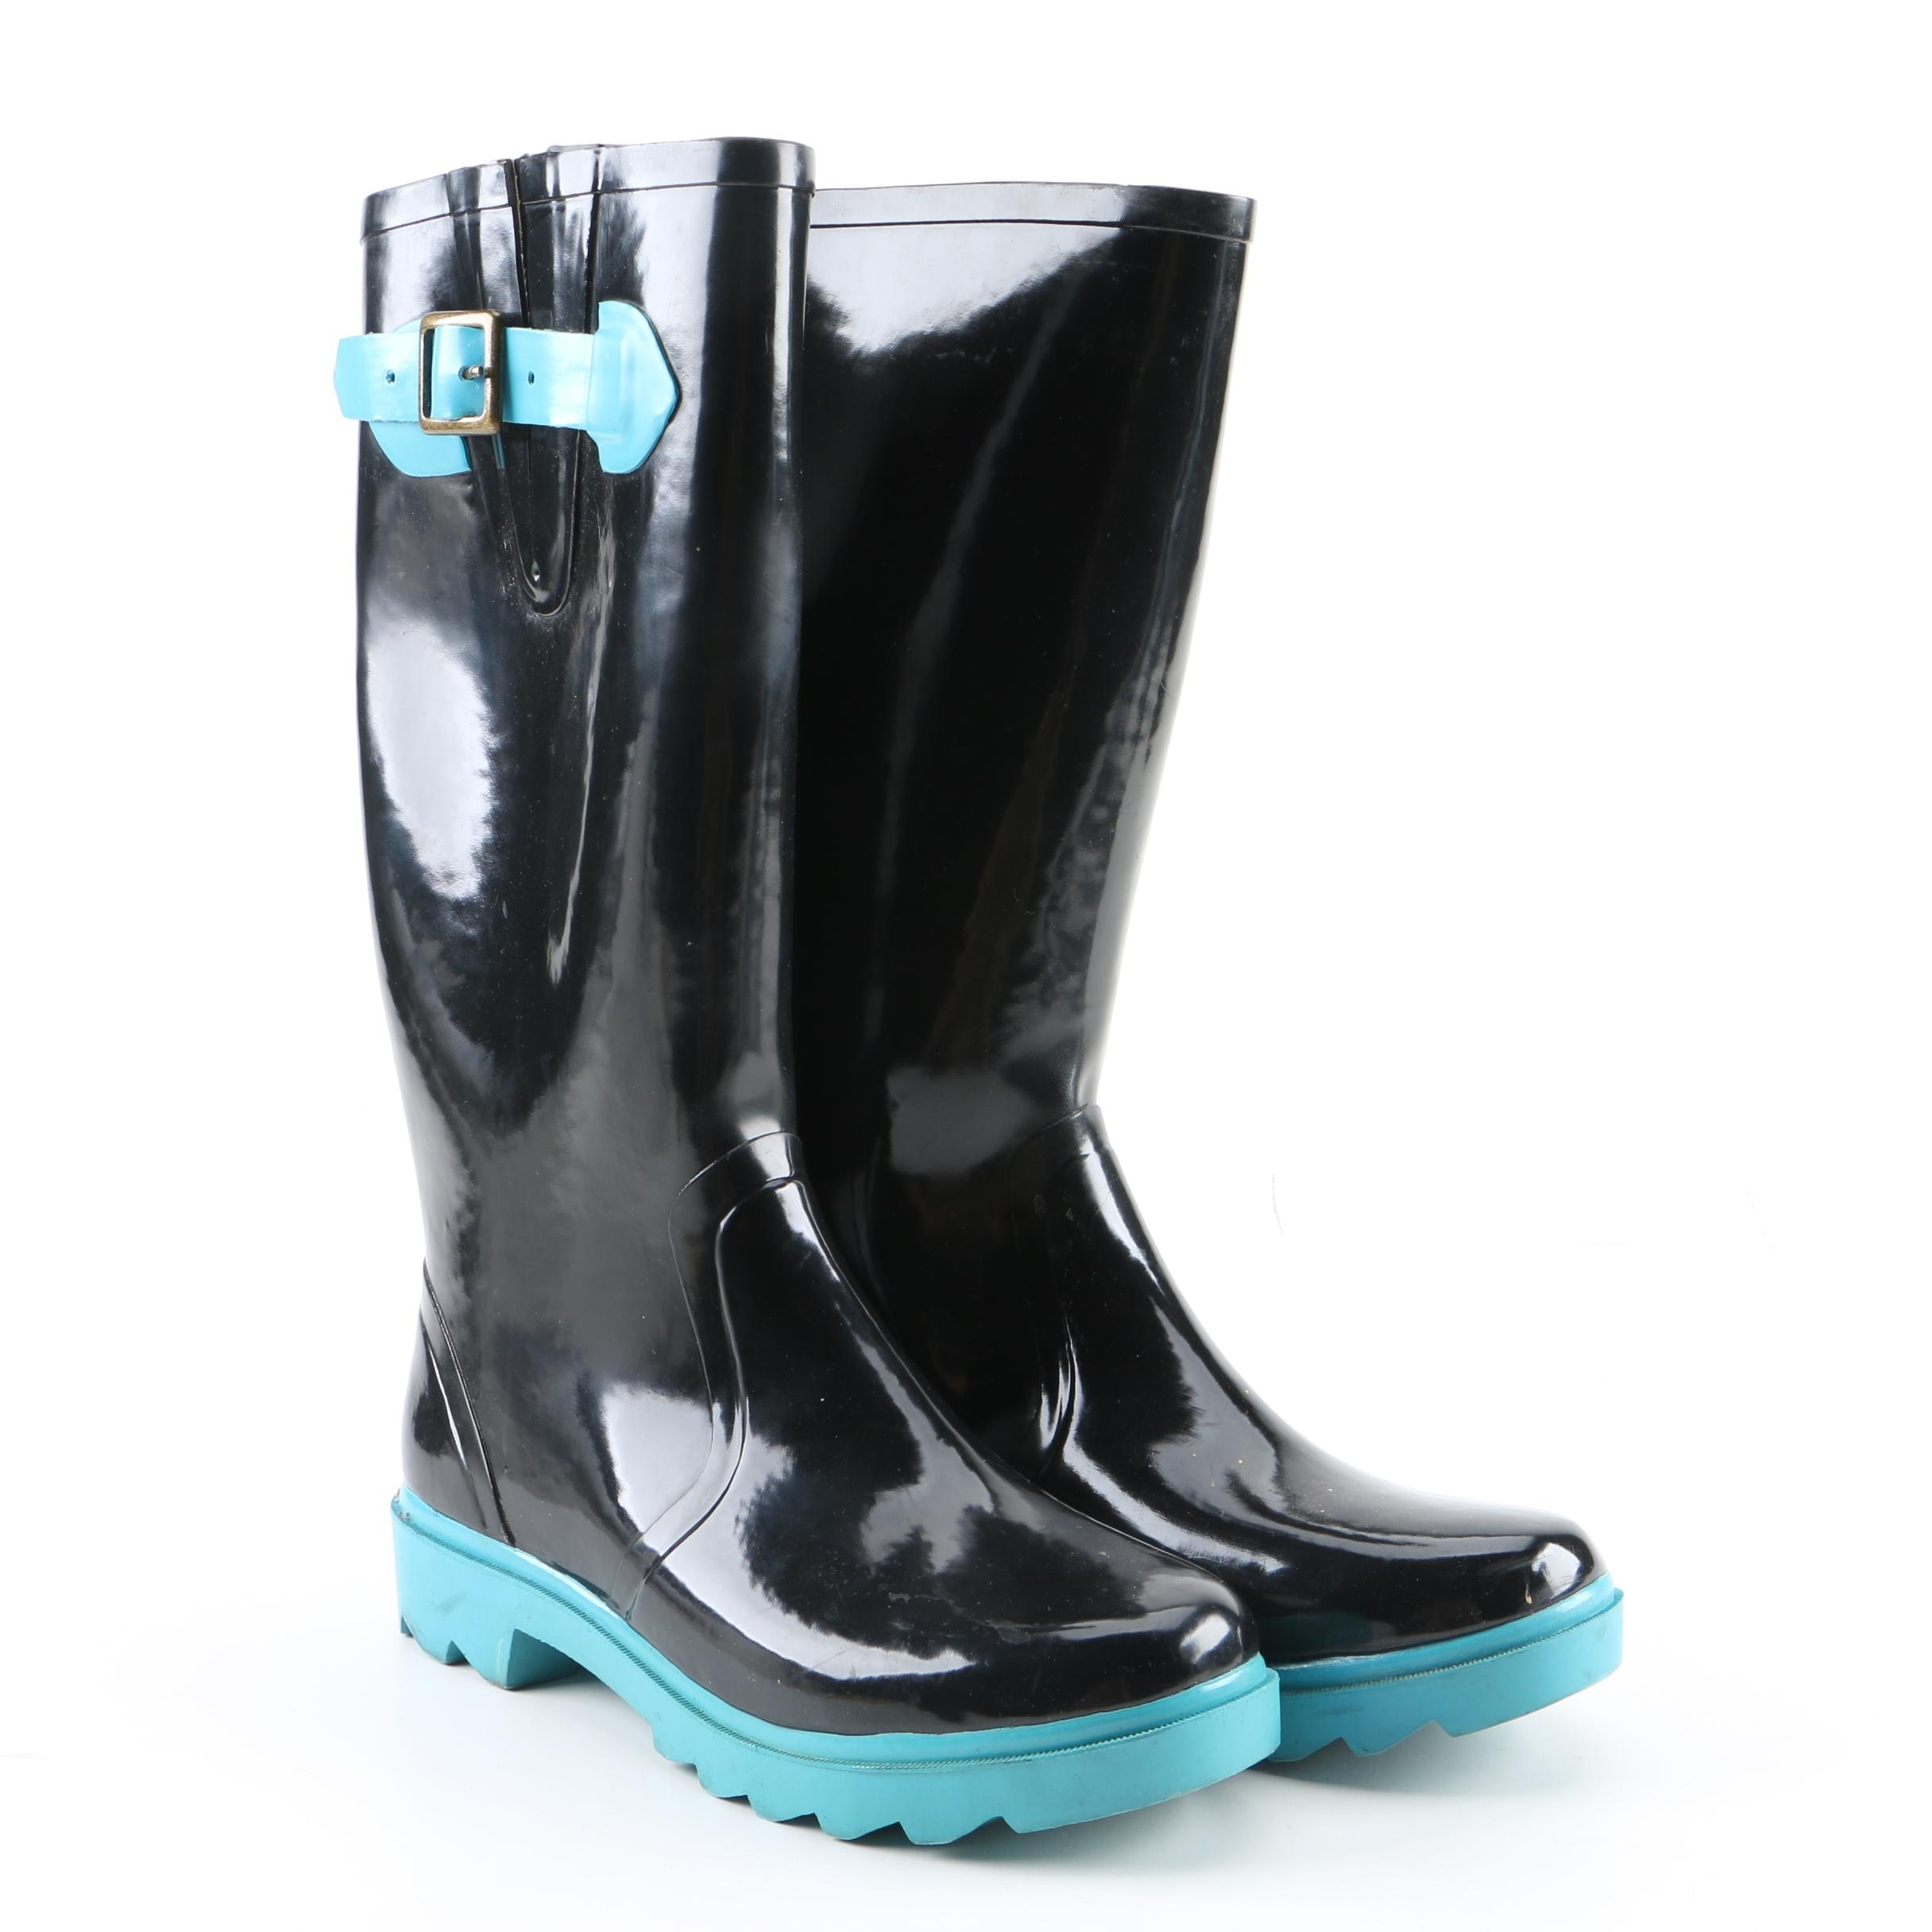 Women's Kate Spade New York Black Rubber Rain Boots